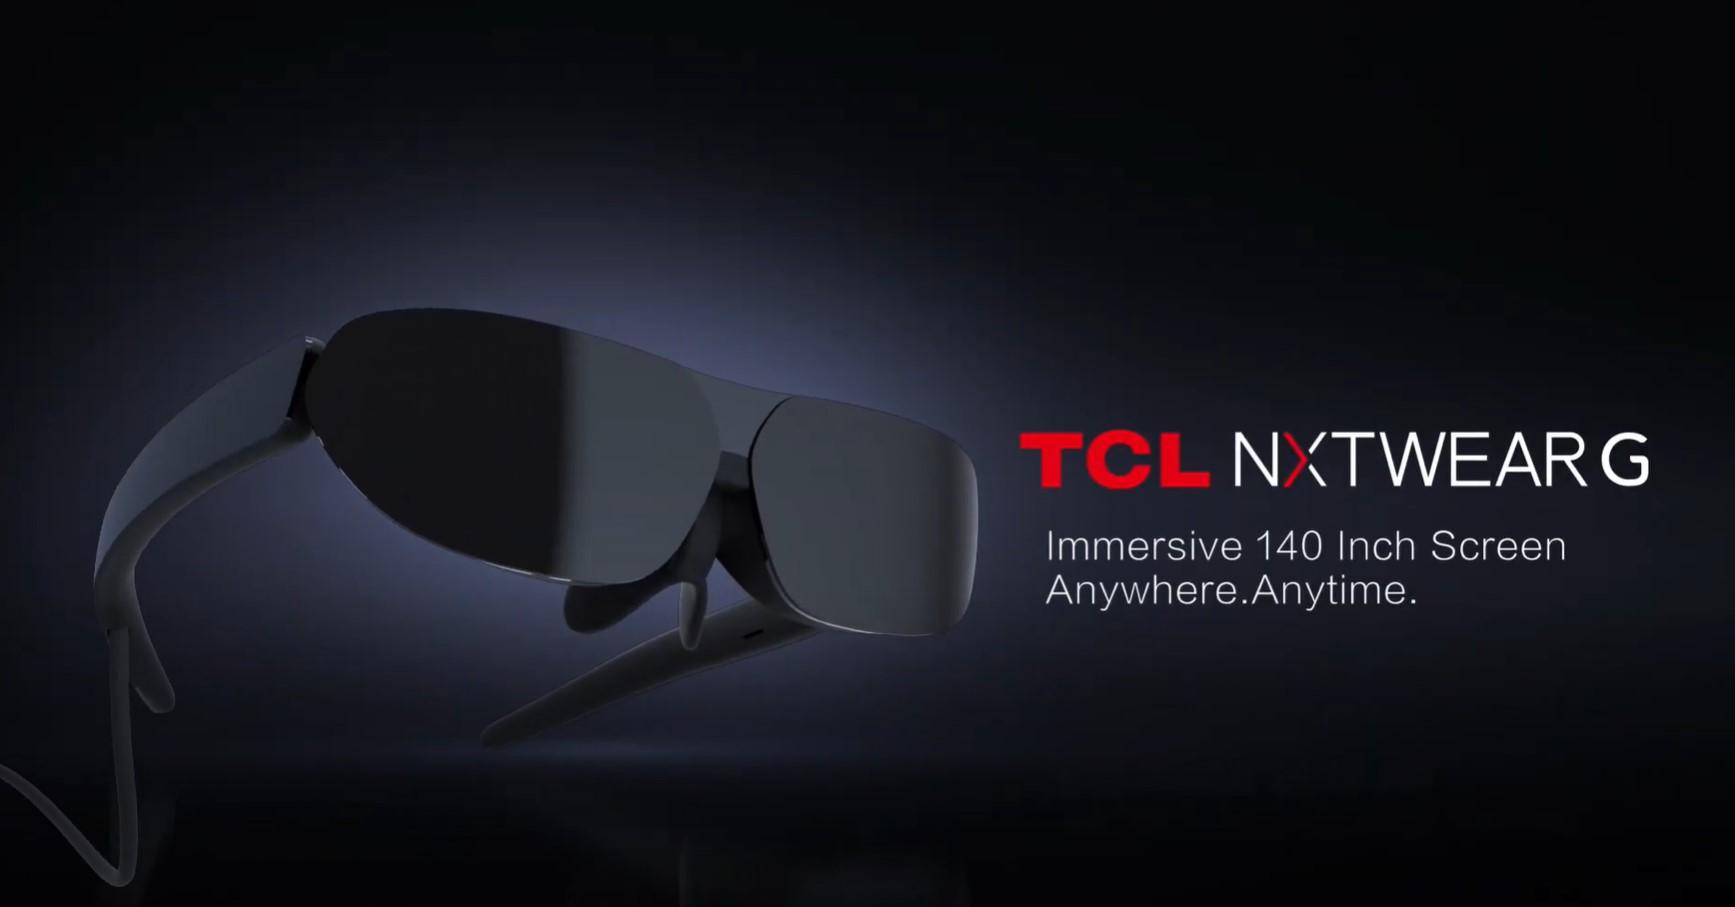 TCL Nxtwear G